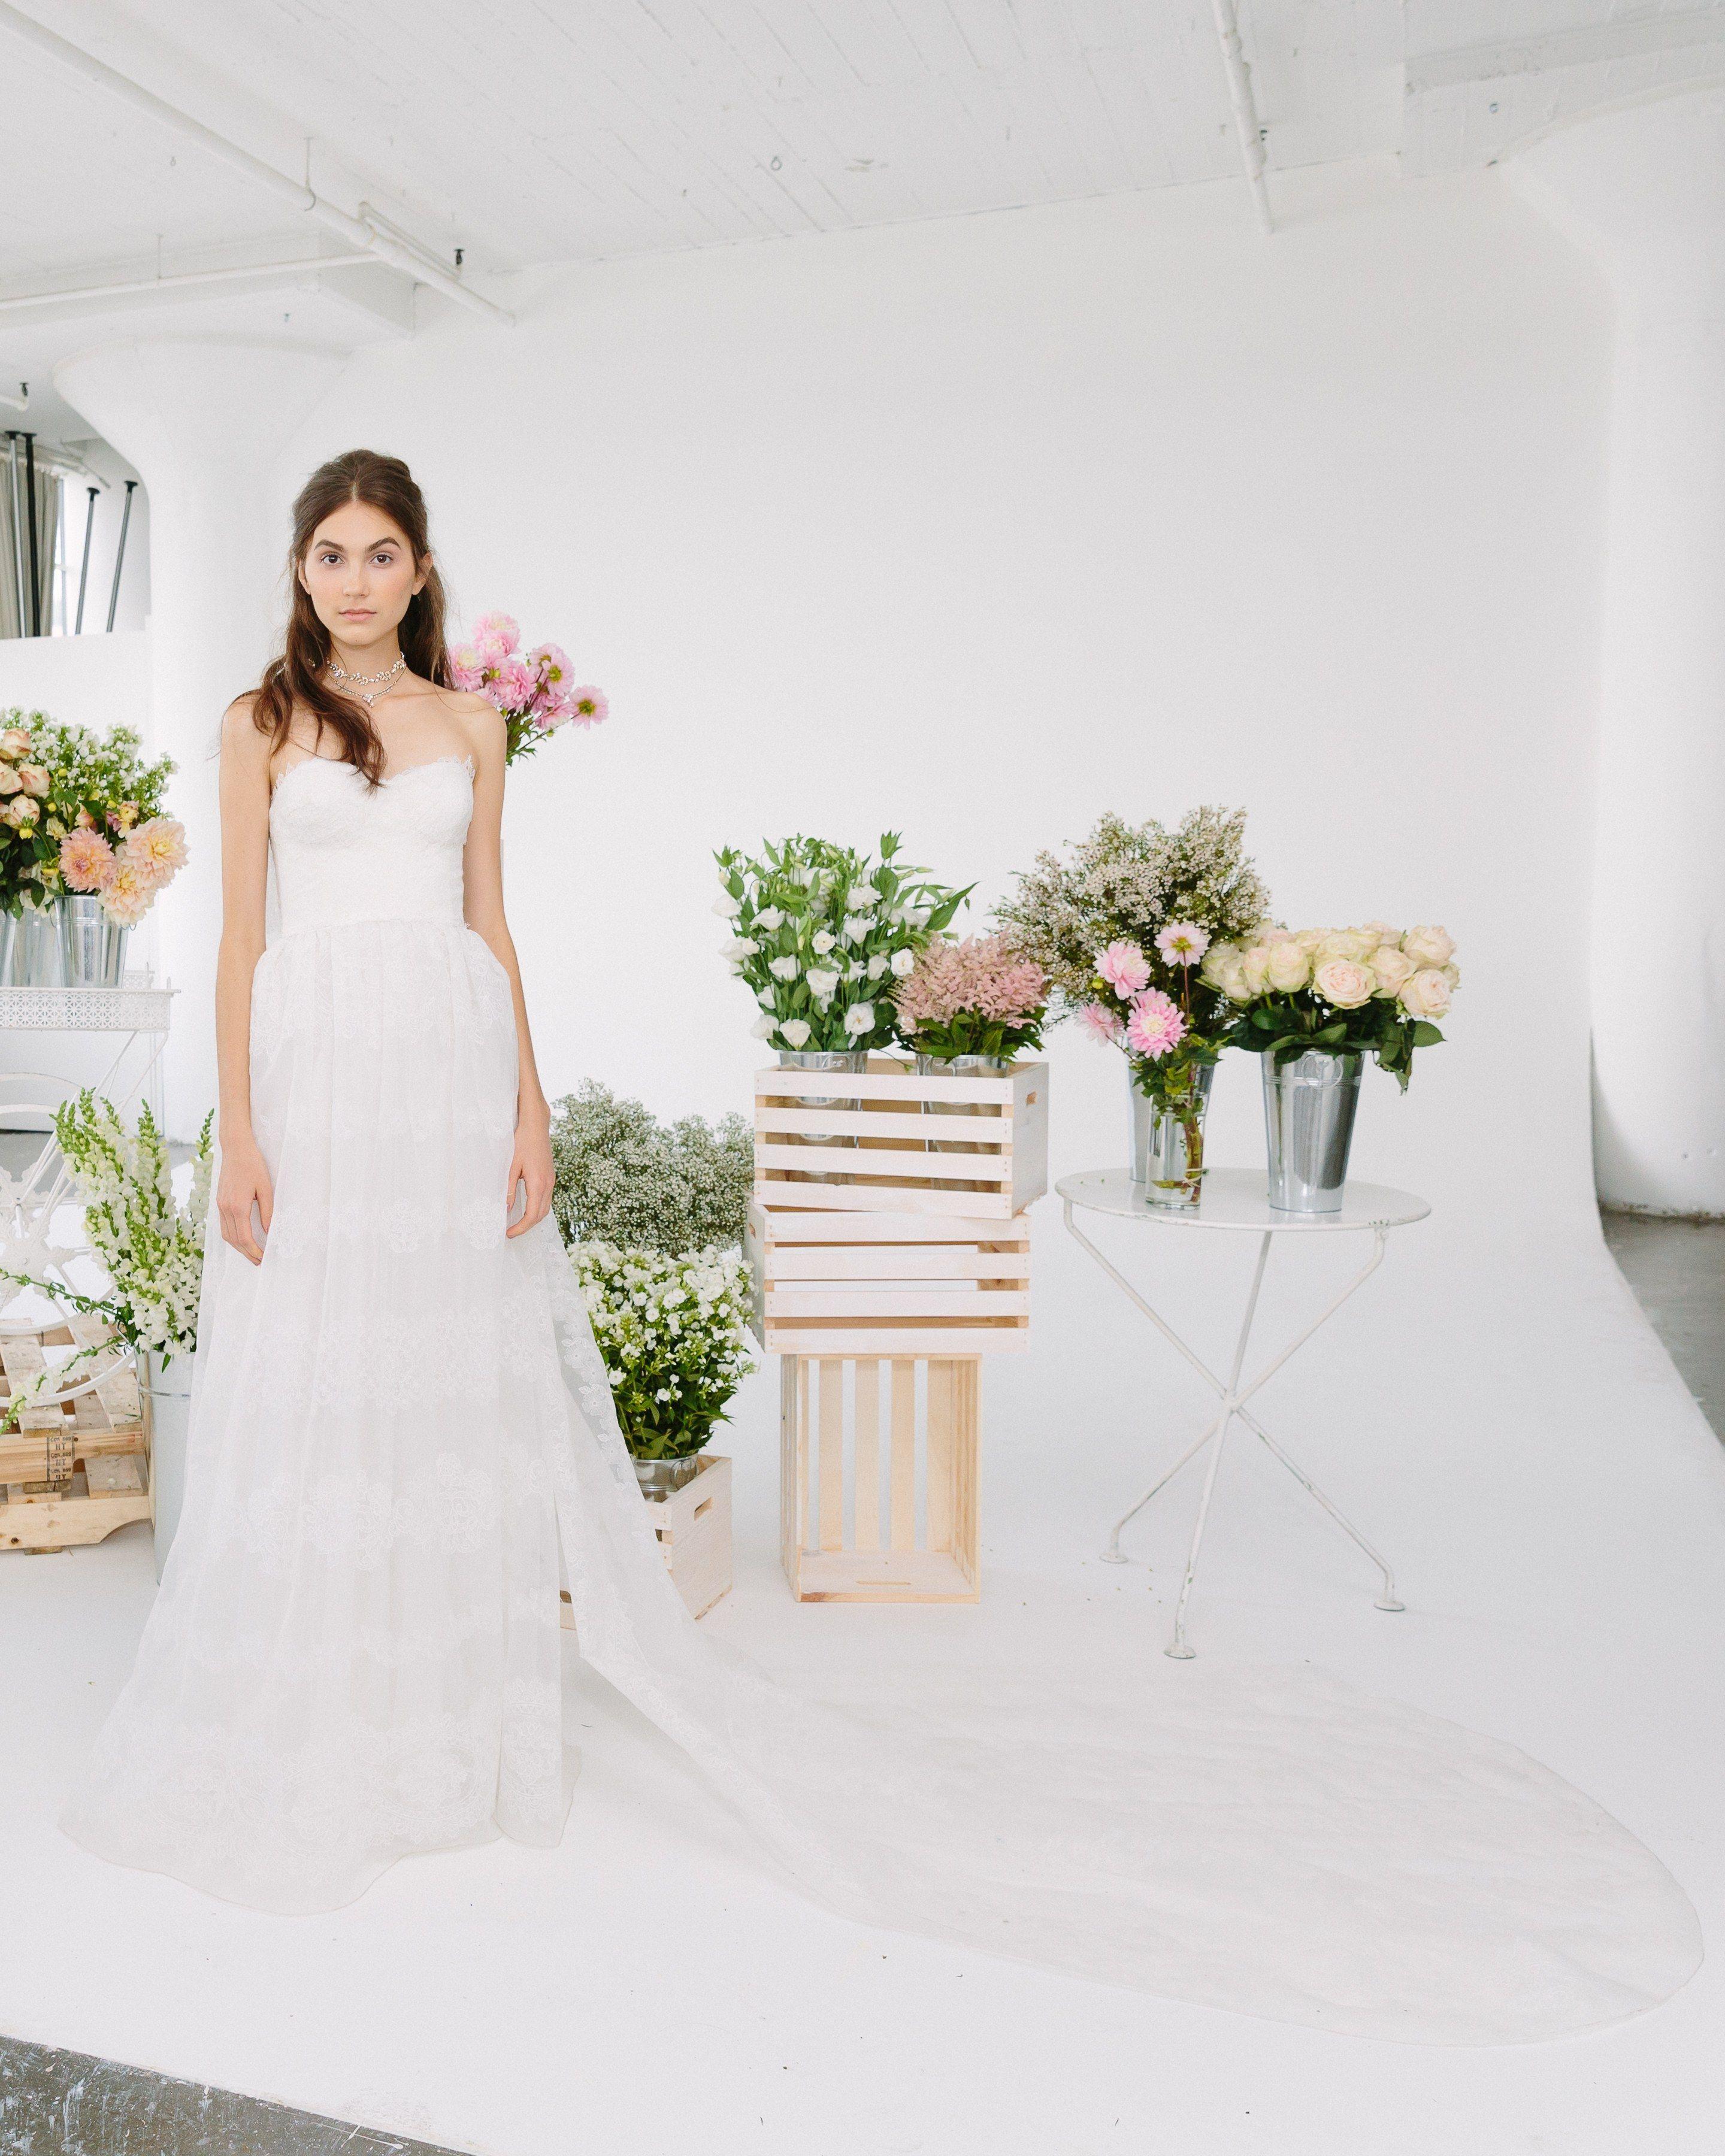 Marchesa notte bridal u wedding dress collection fall brides